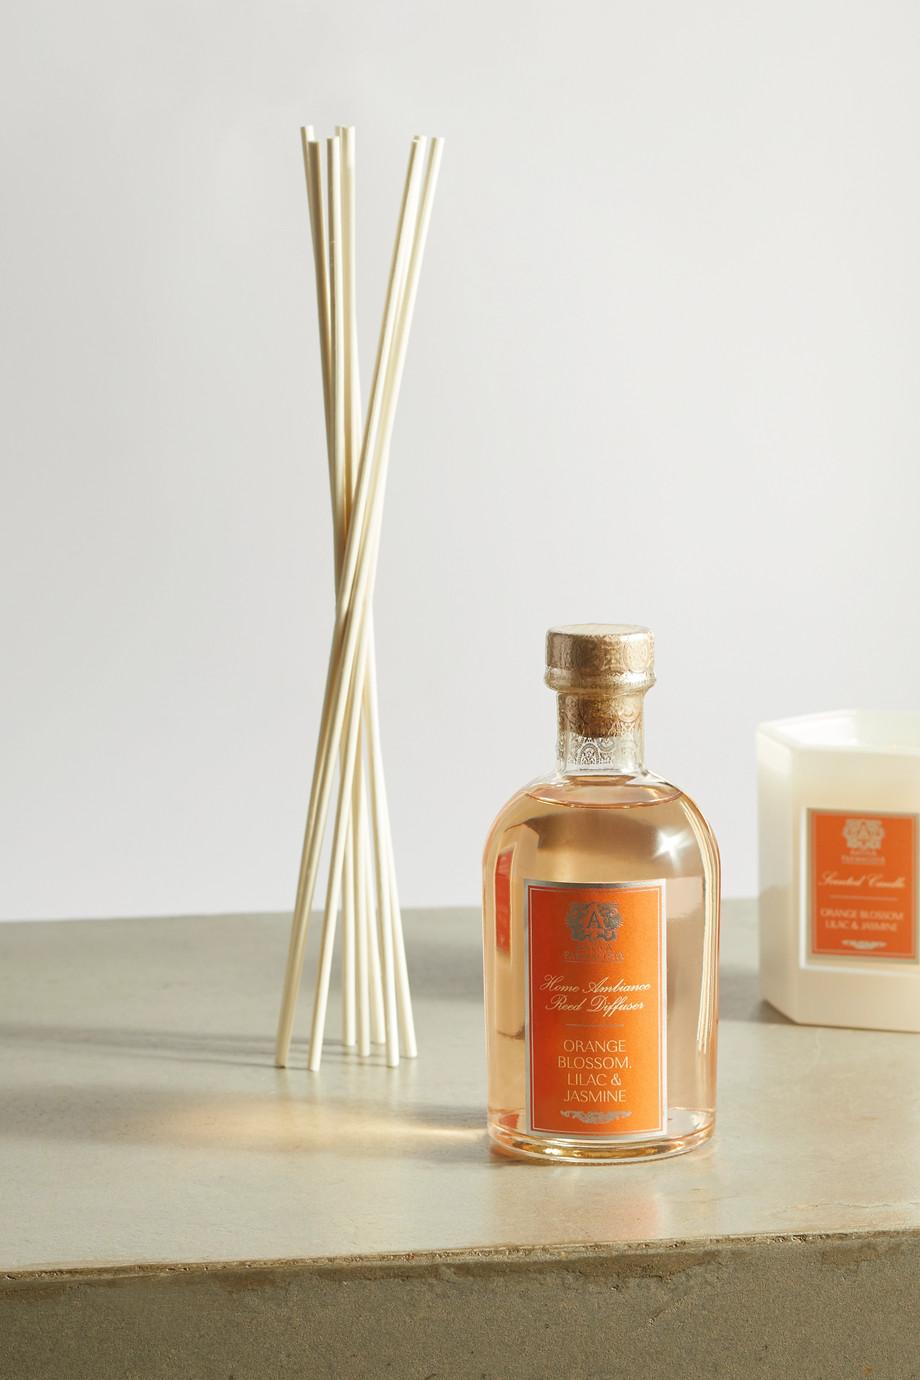 Antica Farmacista Orange Blossom, Lilac & Jasmine reed diffuser, 250ml